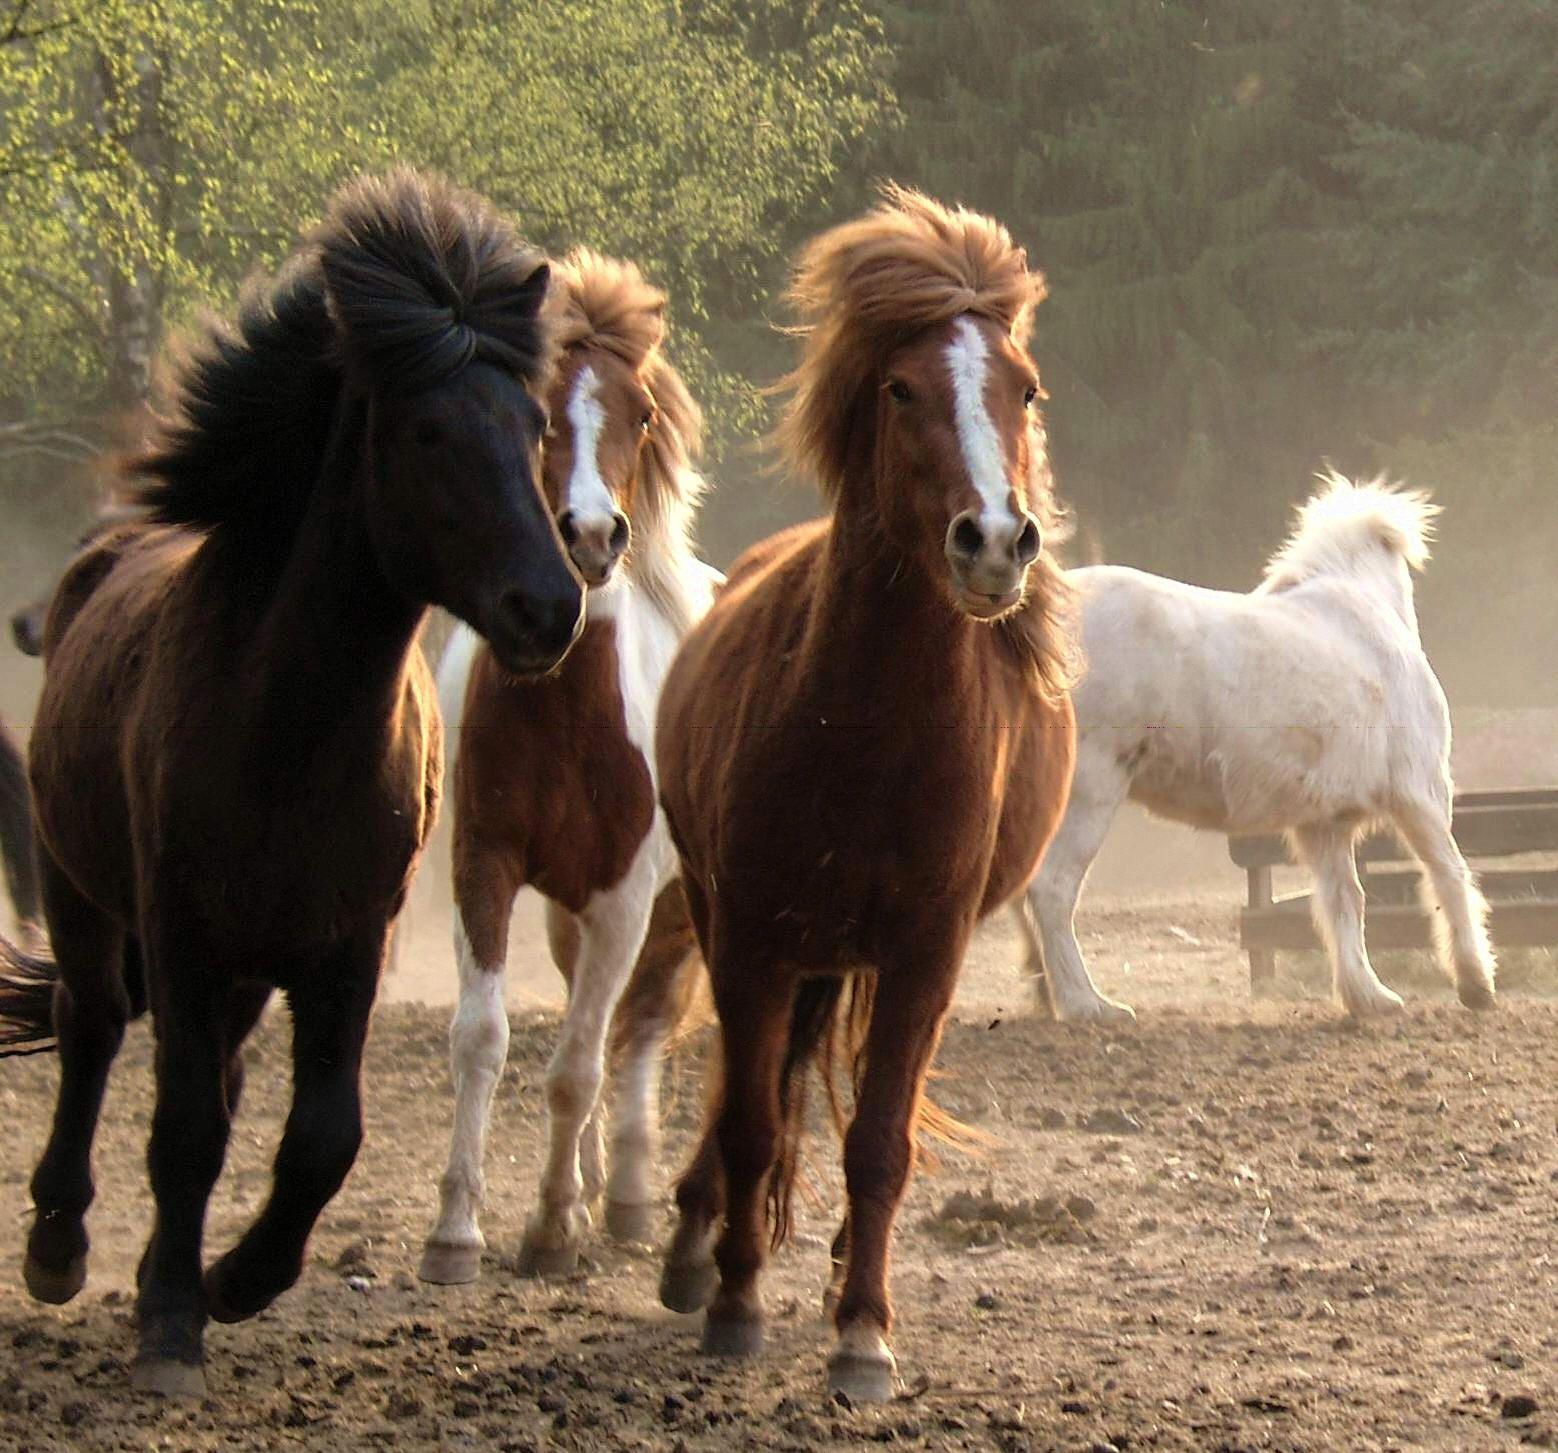 Jungpferdeaufzucht Alles Fur Die Pferde Auf Dem Gestut Nahetal Pferde Islandpferde Pferd